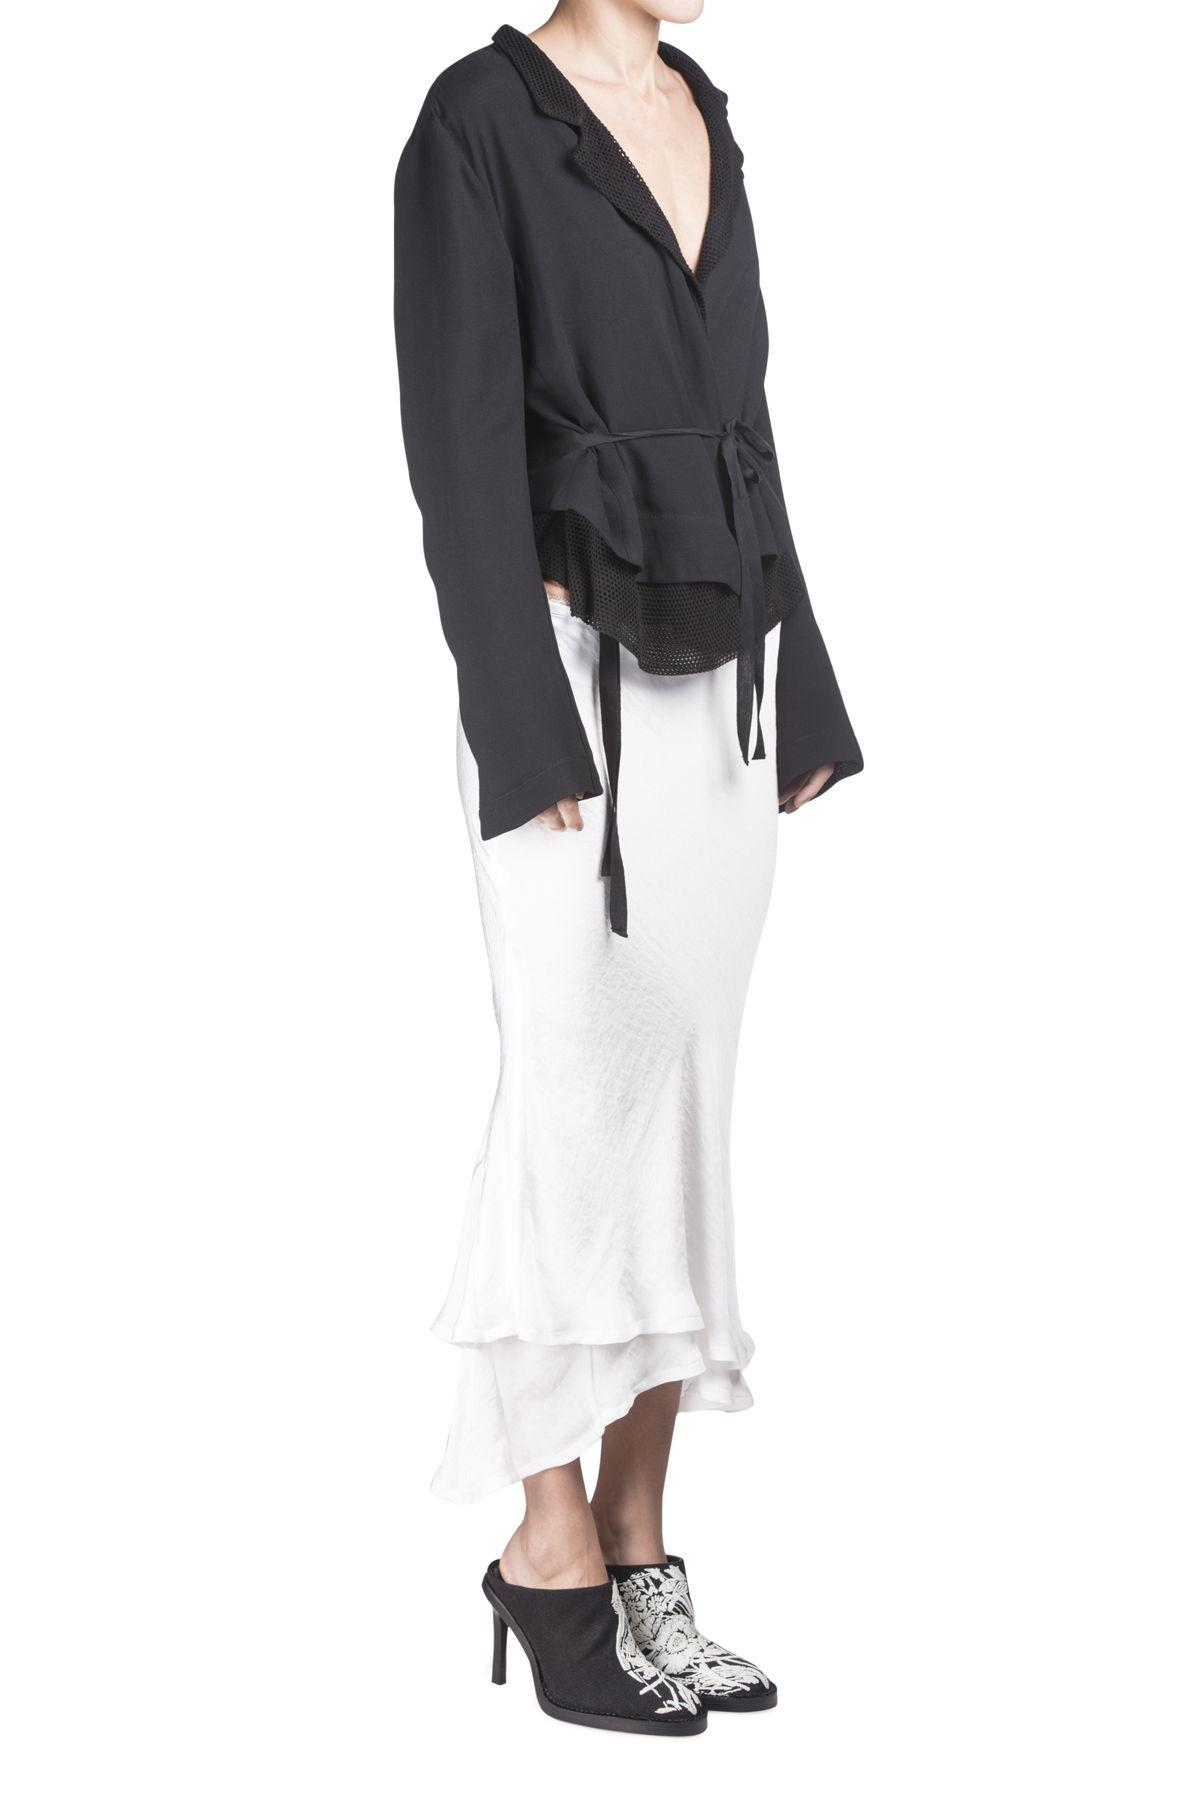 Haider Ackermann Ivory Ruffles Hem Skirt #Shopafar #HaiderAckermann #ruffle #detail #fashion #luxury #ss15 #black&white #silk #lace